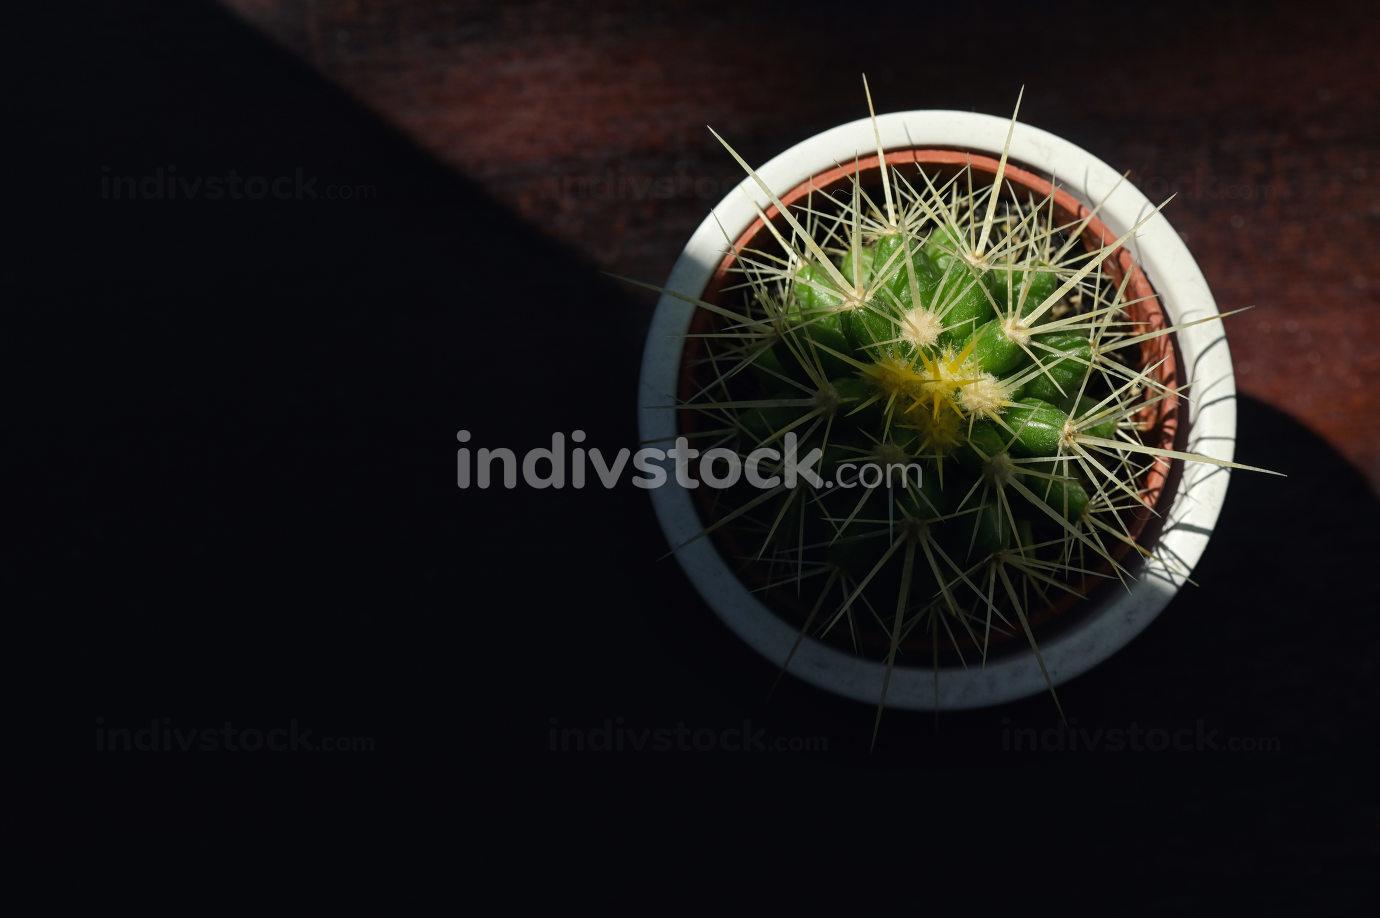 Single cactus plants and sunlight